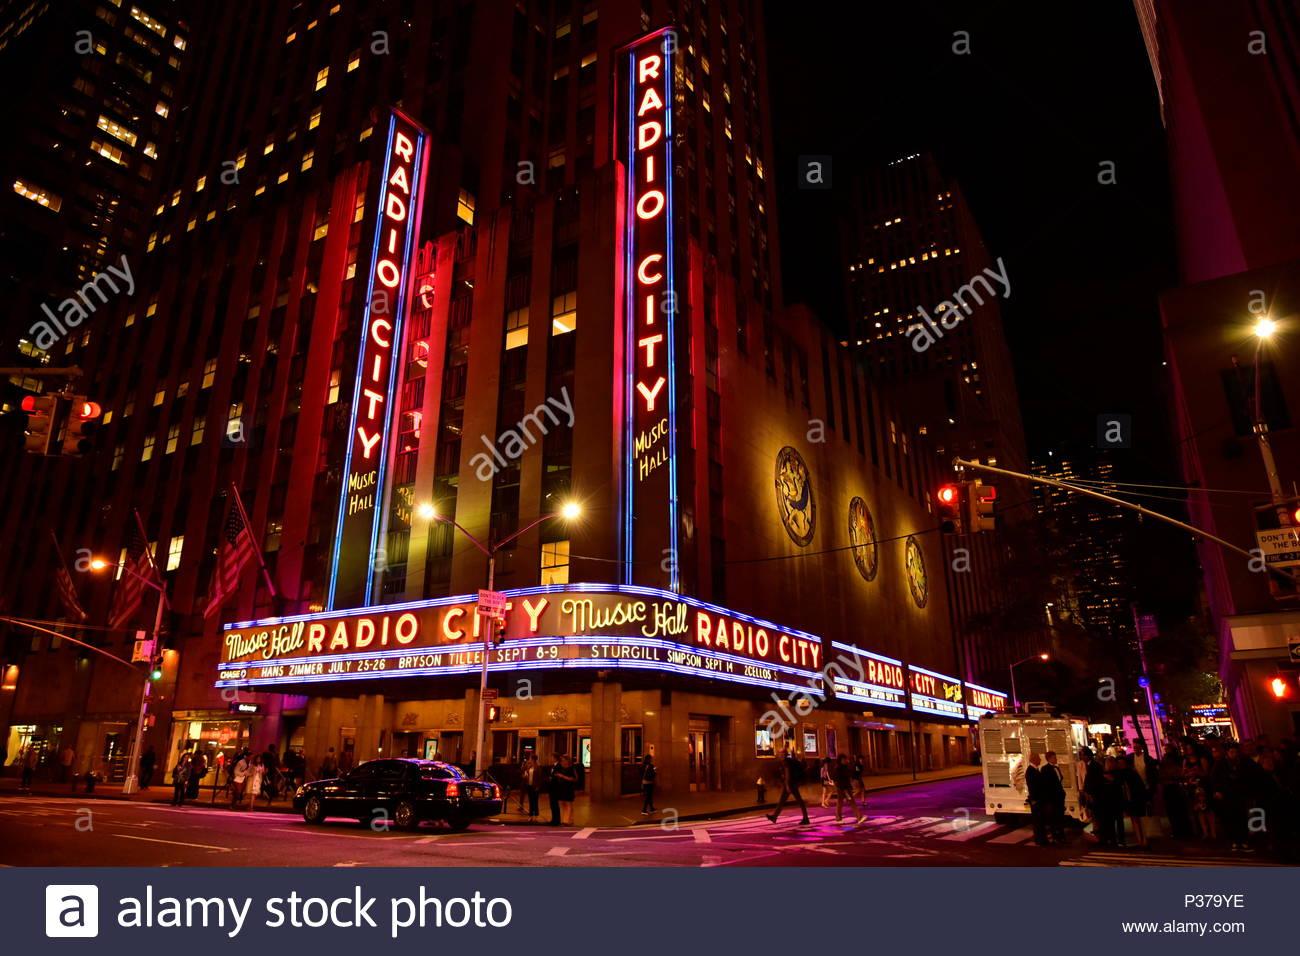 Radio City Music Hall At Night, New York City   Stock Image